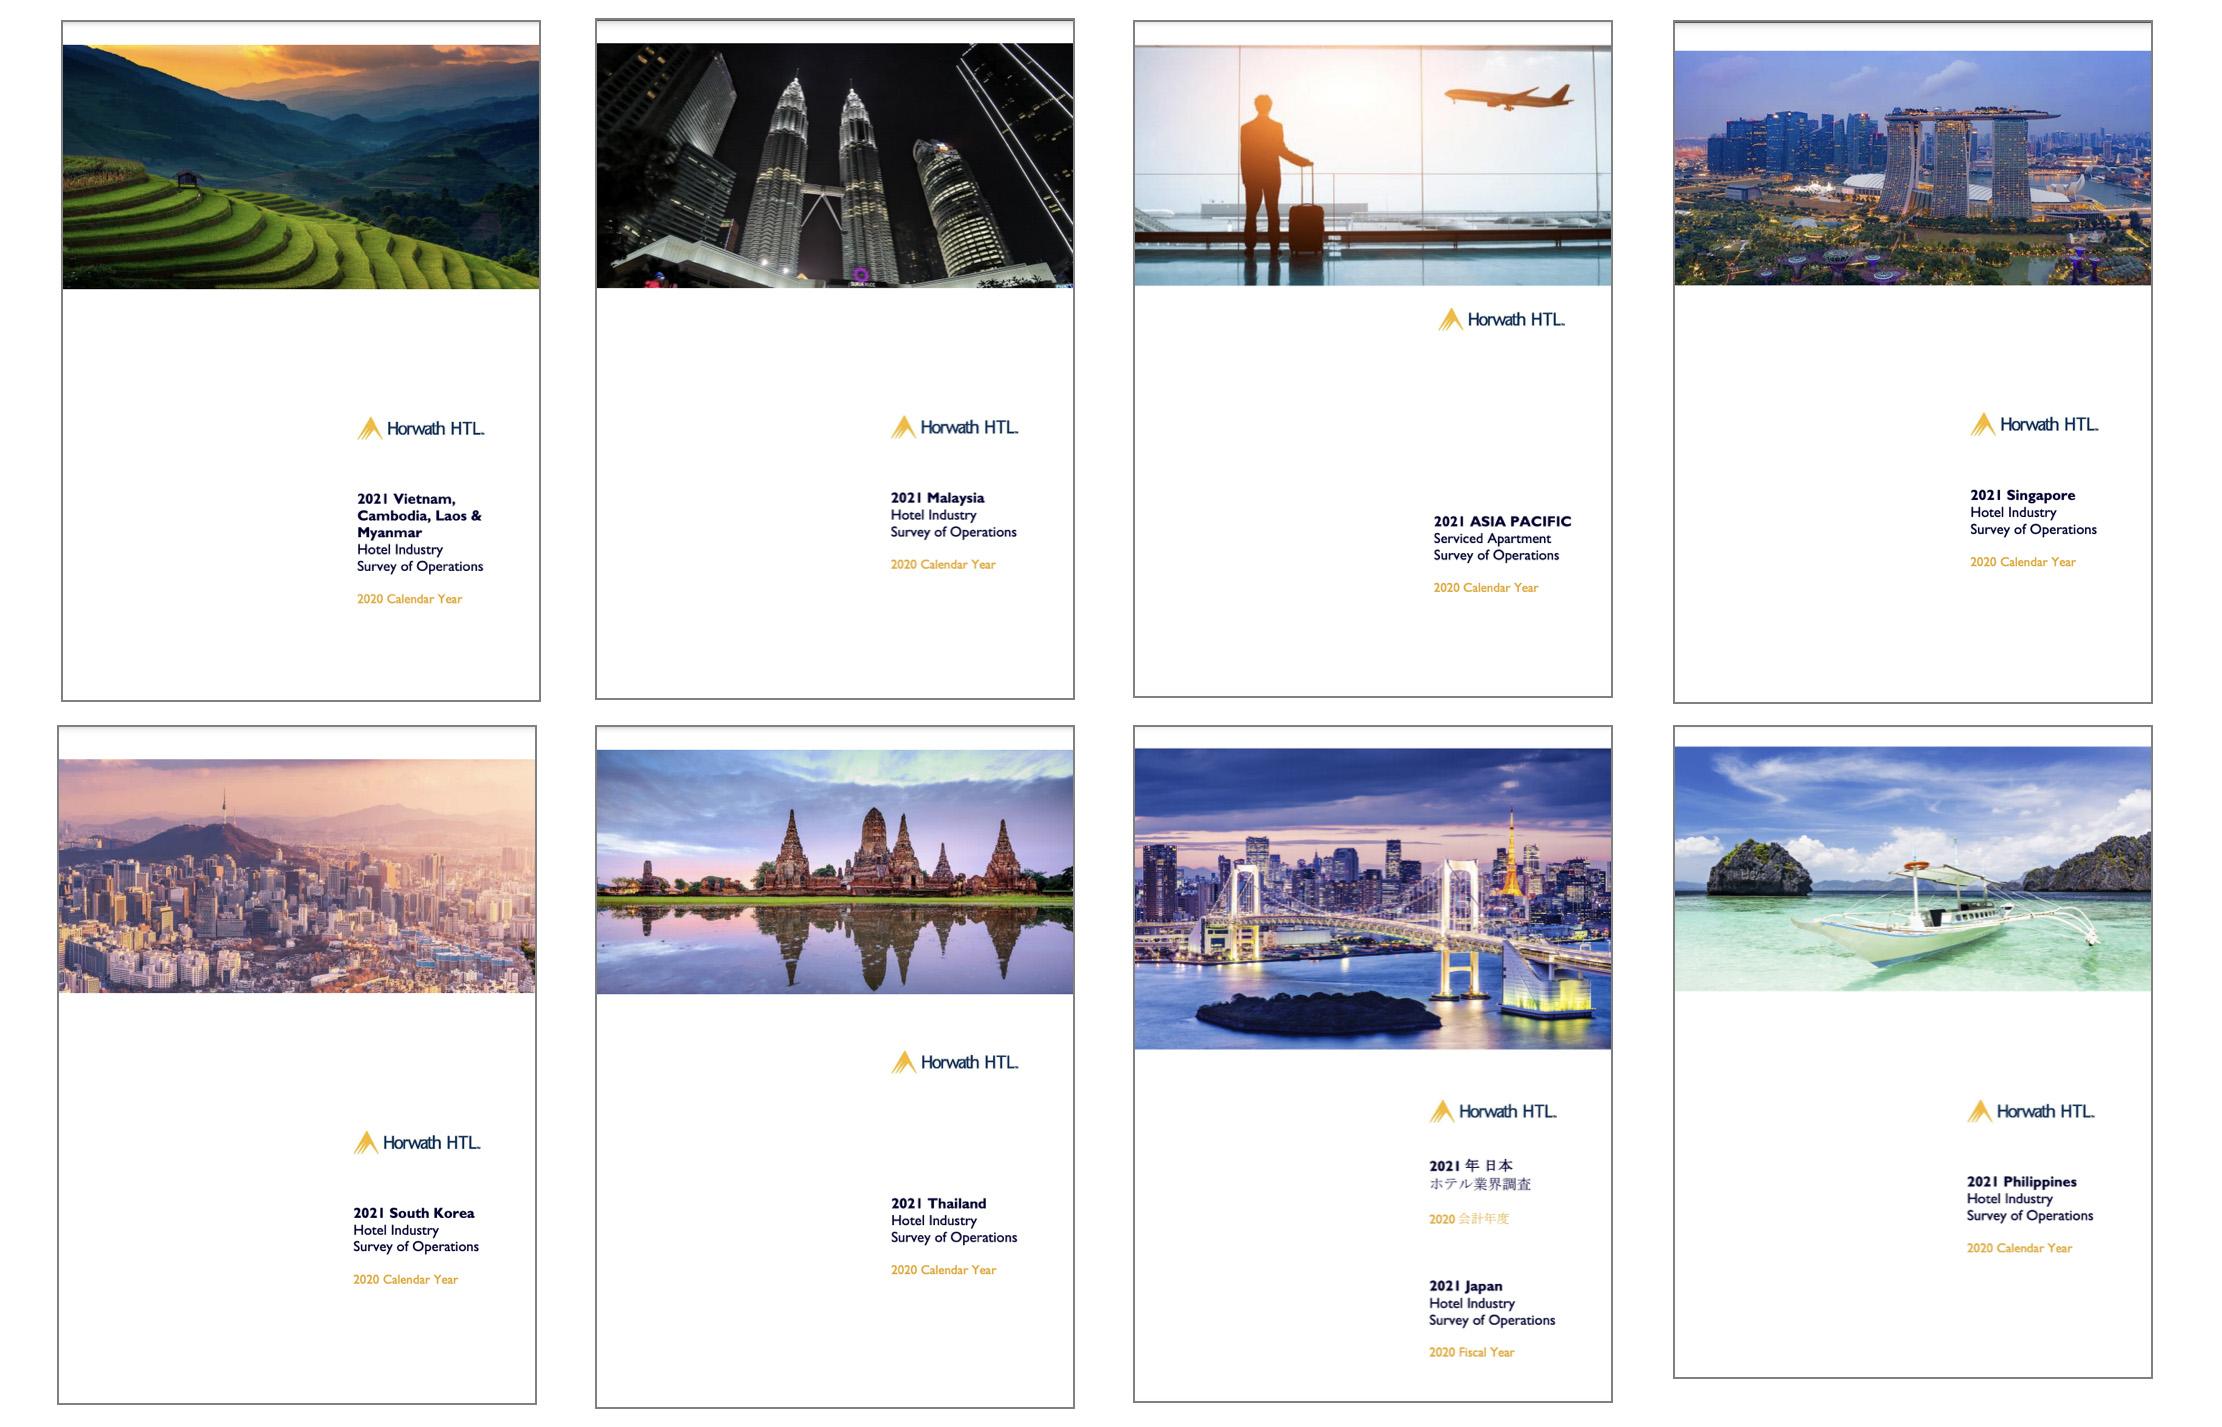 2021 Horwath HTL Asia Pacific Hotel & Serviced Apartment Surveys